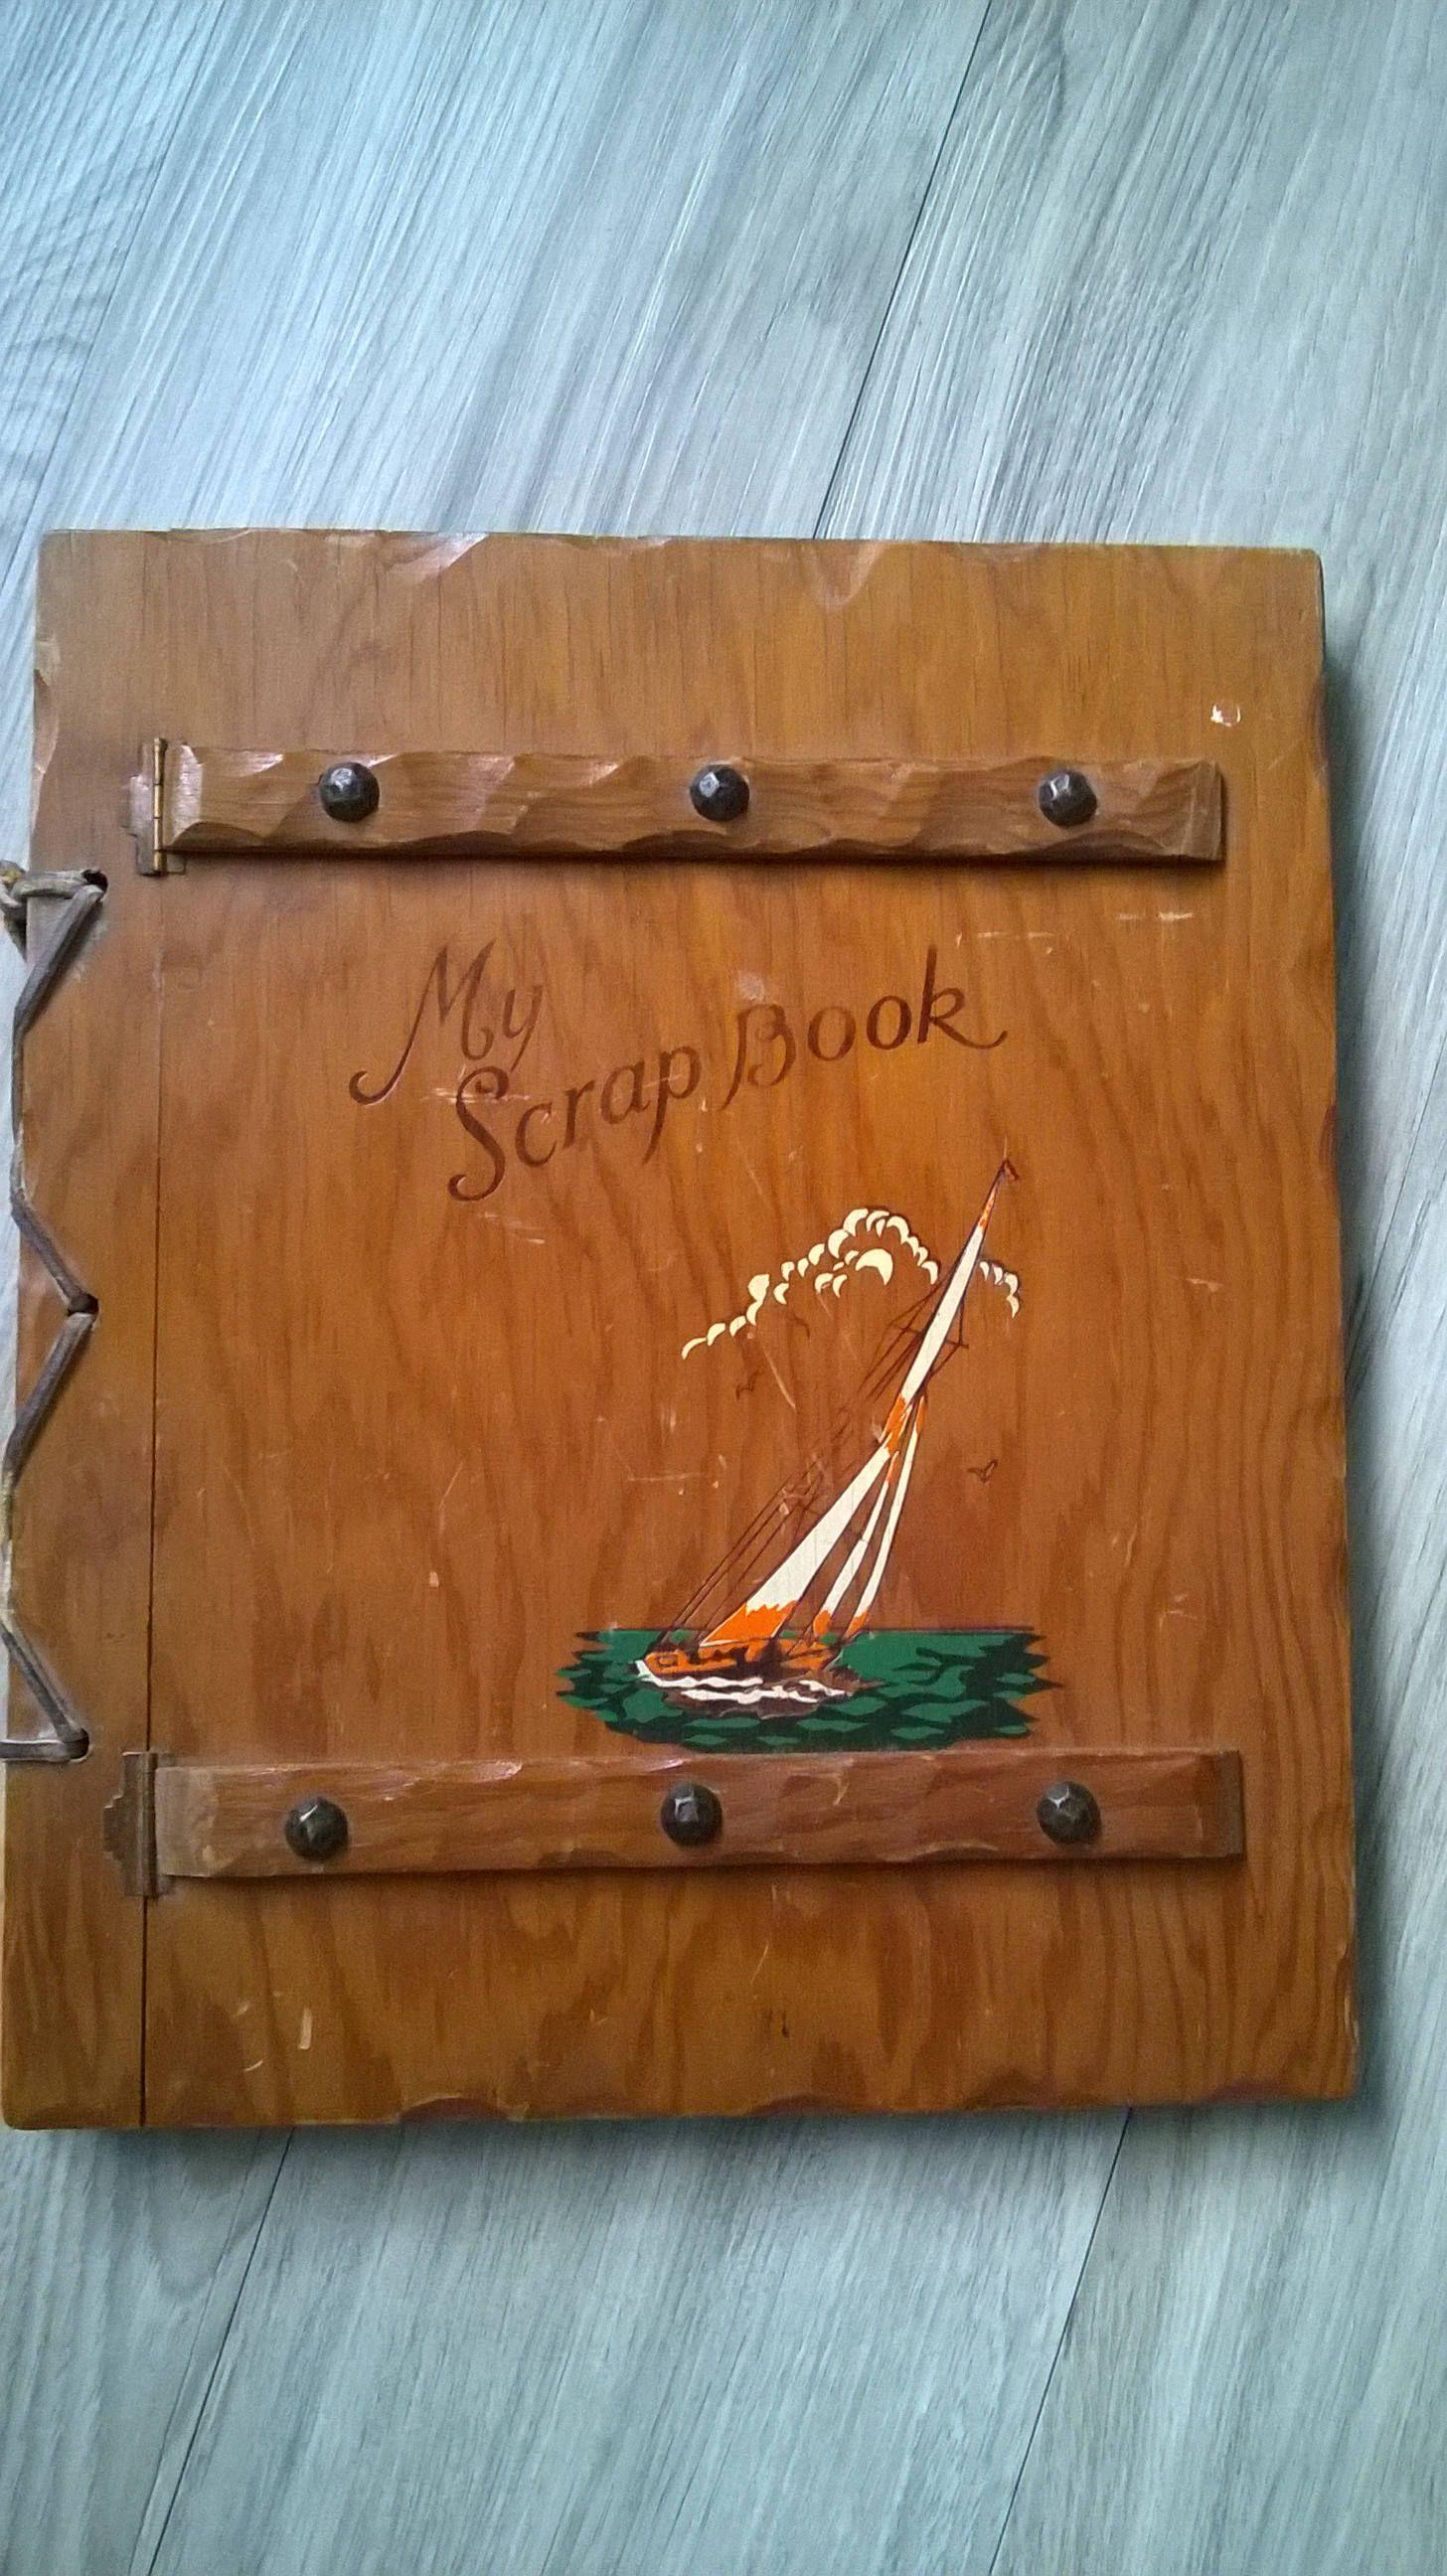 1950s Wooden Scrapbook Curious Vintage Stall Pinterest Scrapbook